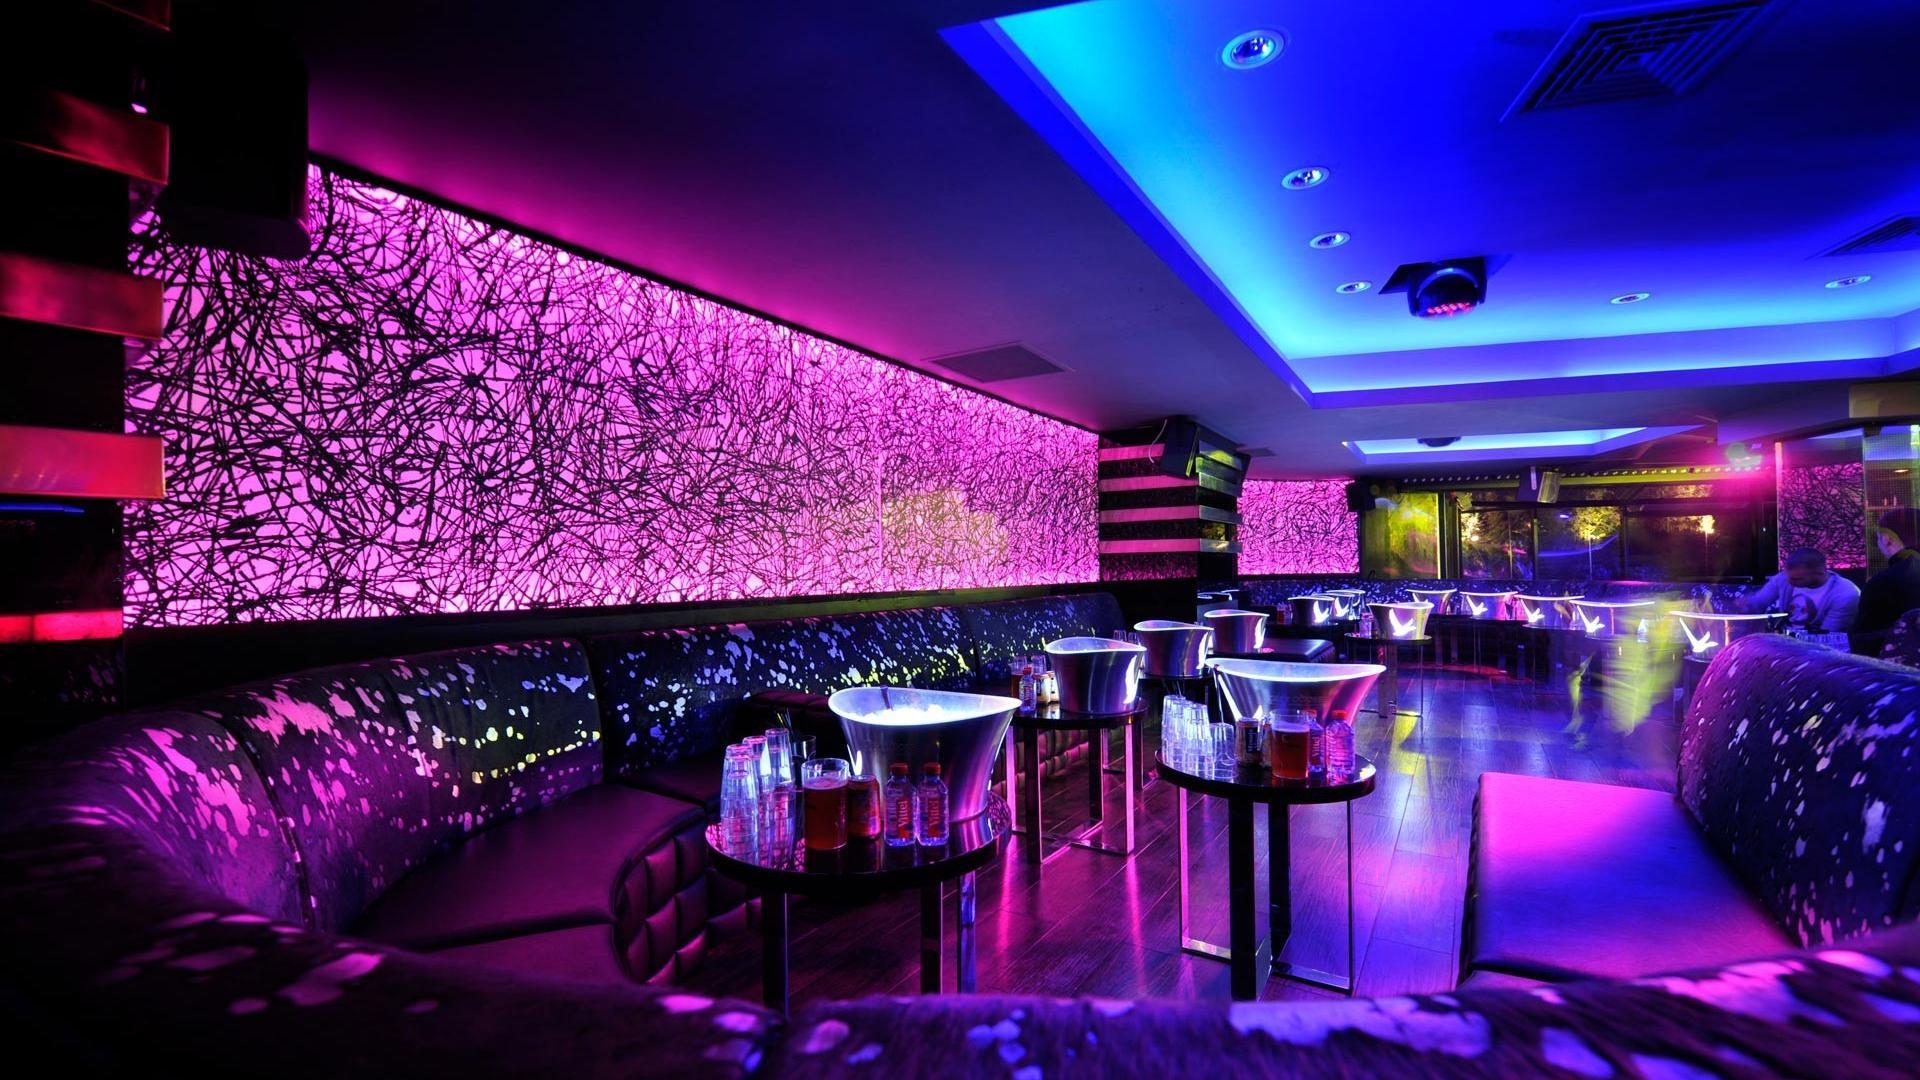 architecture-design-bar-lighting-night-club-neon-lounge-1920x1080-1920×1080-wallpaper-wp3402570